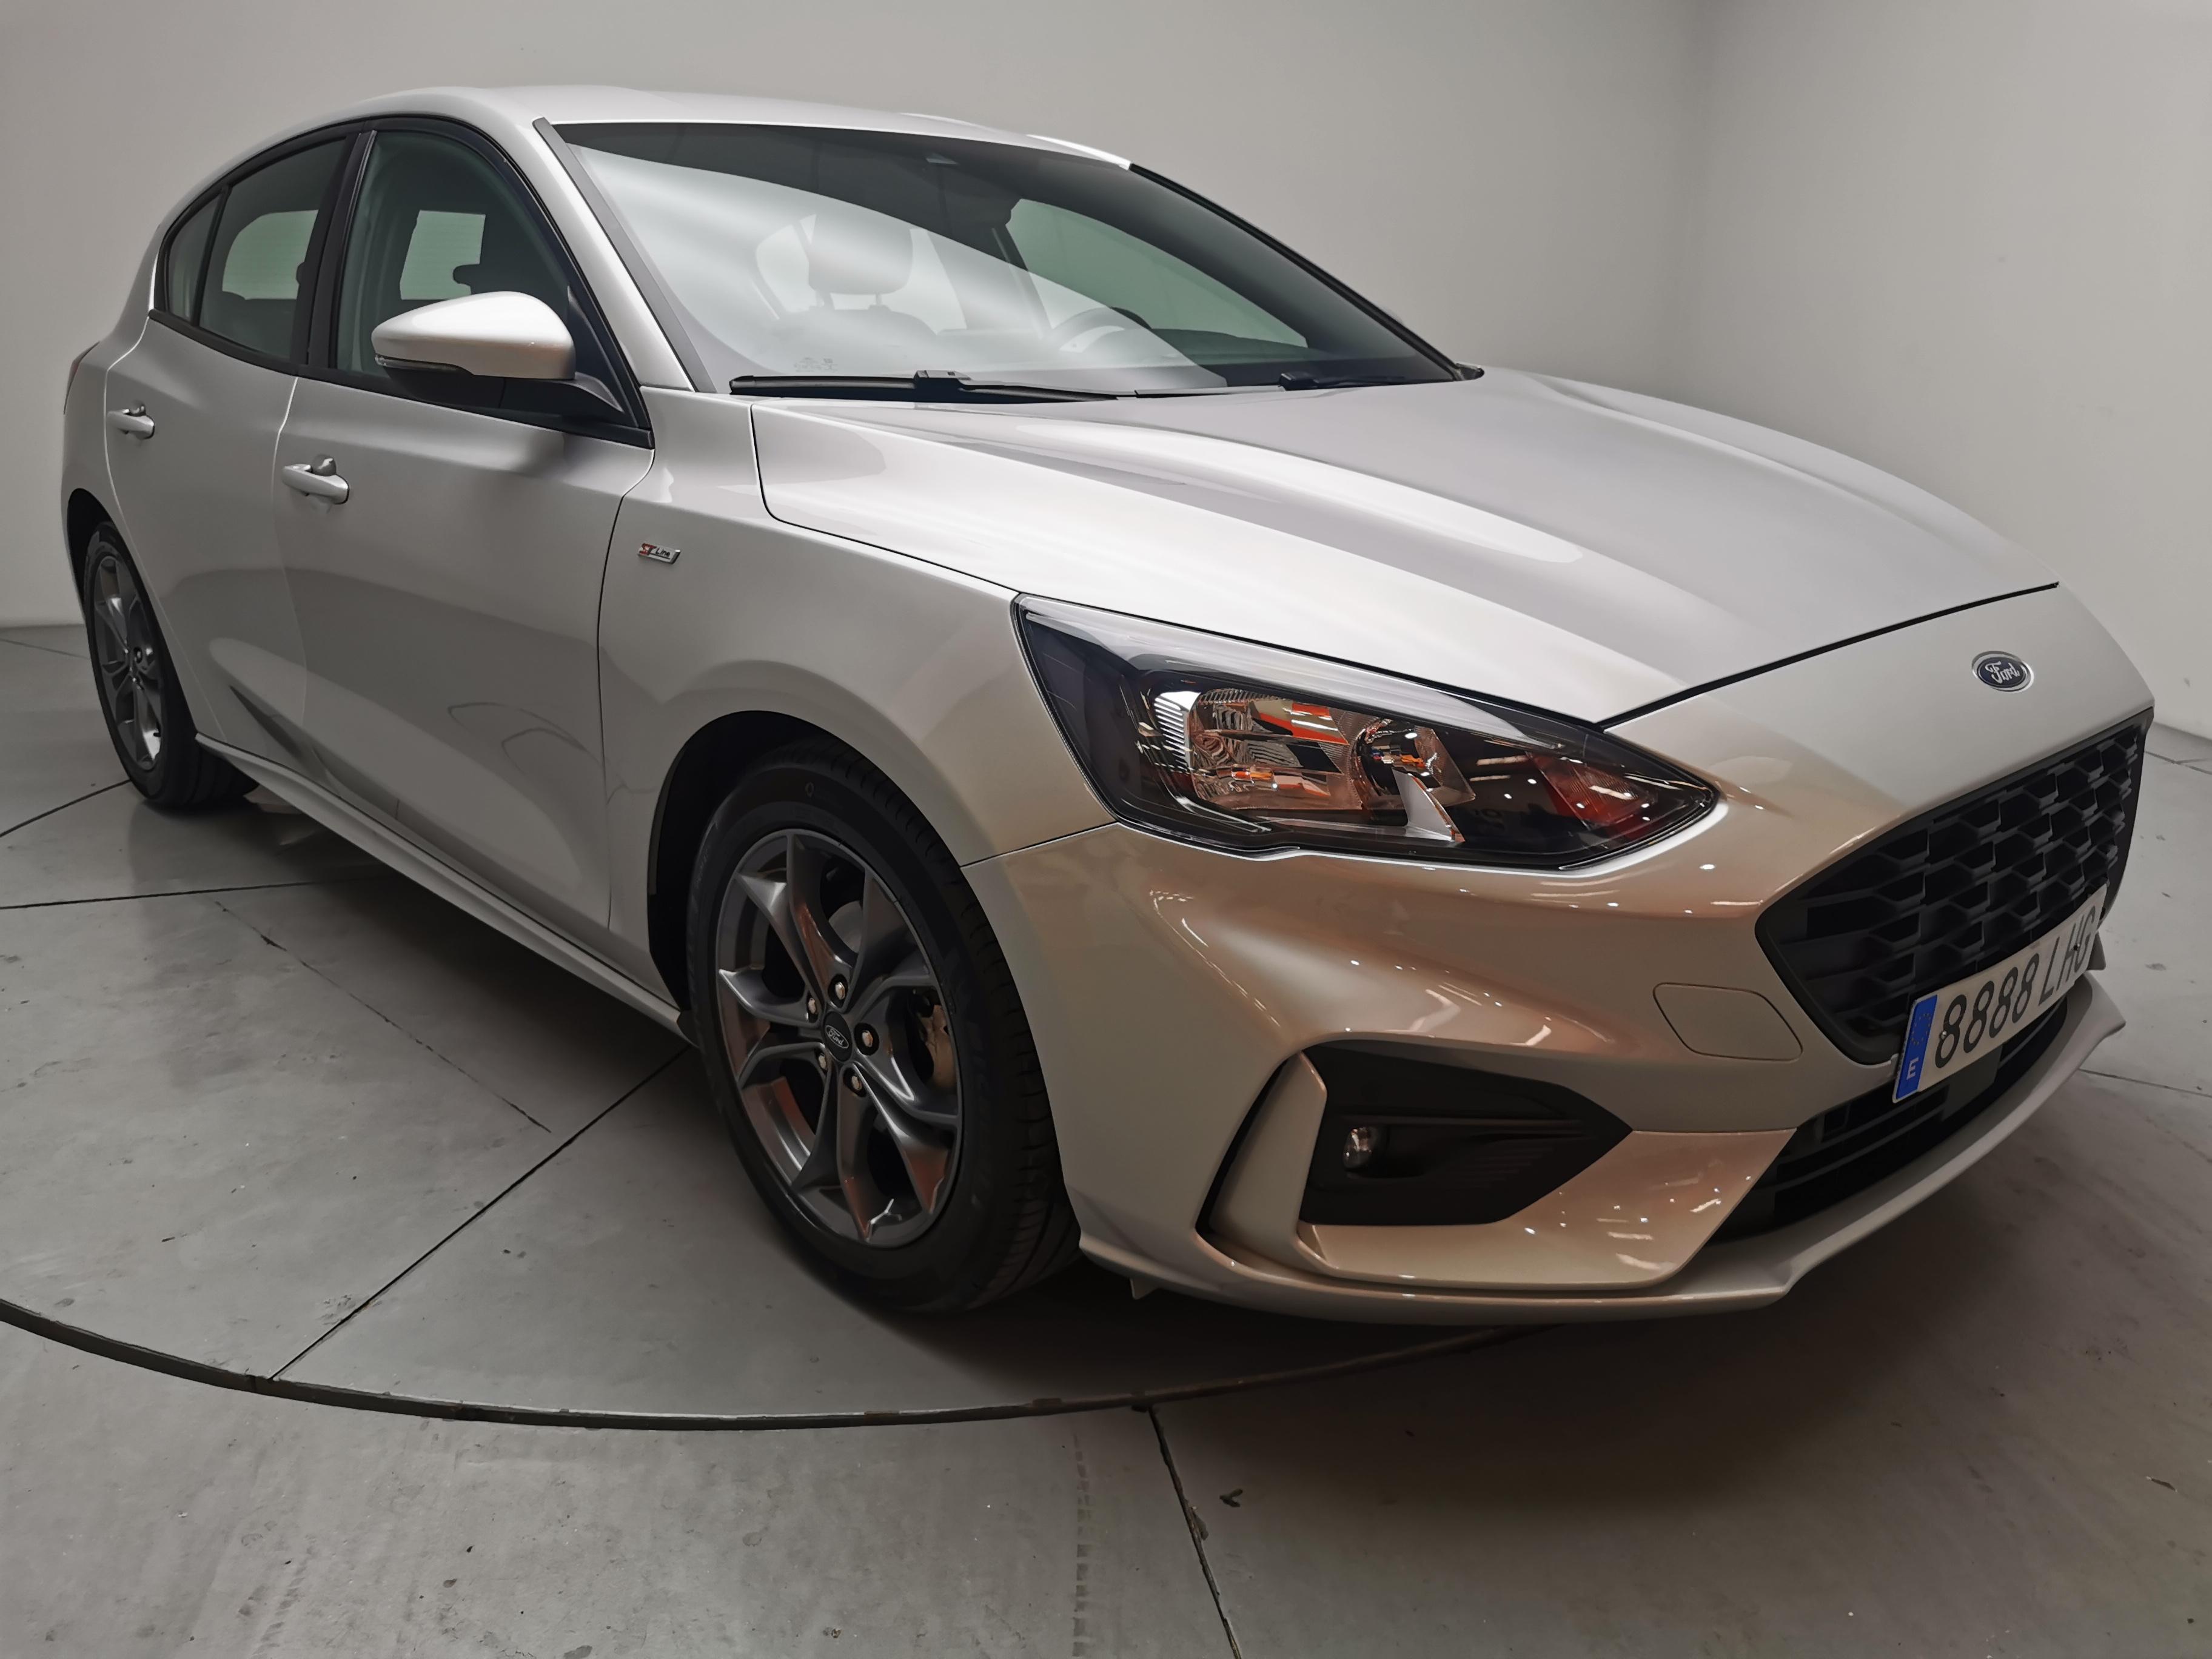 Ford Focus ocasión segunda mano 2020 Gasolina por 21.700€ en Málaga